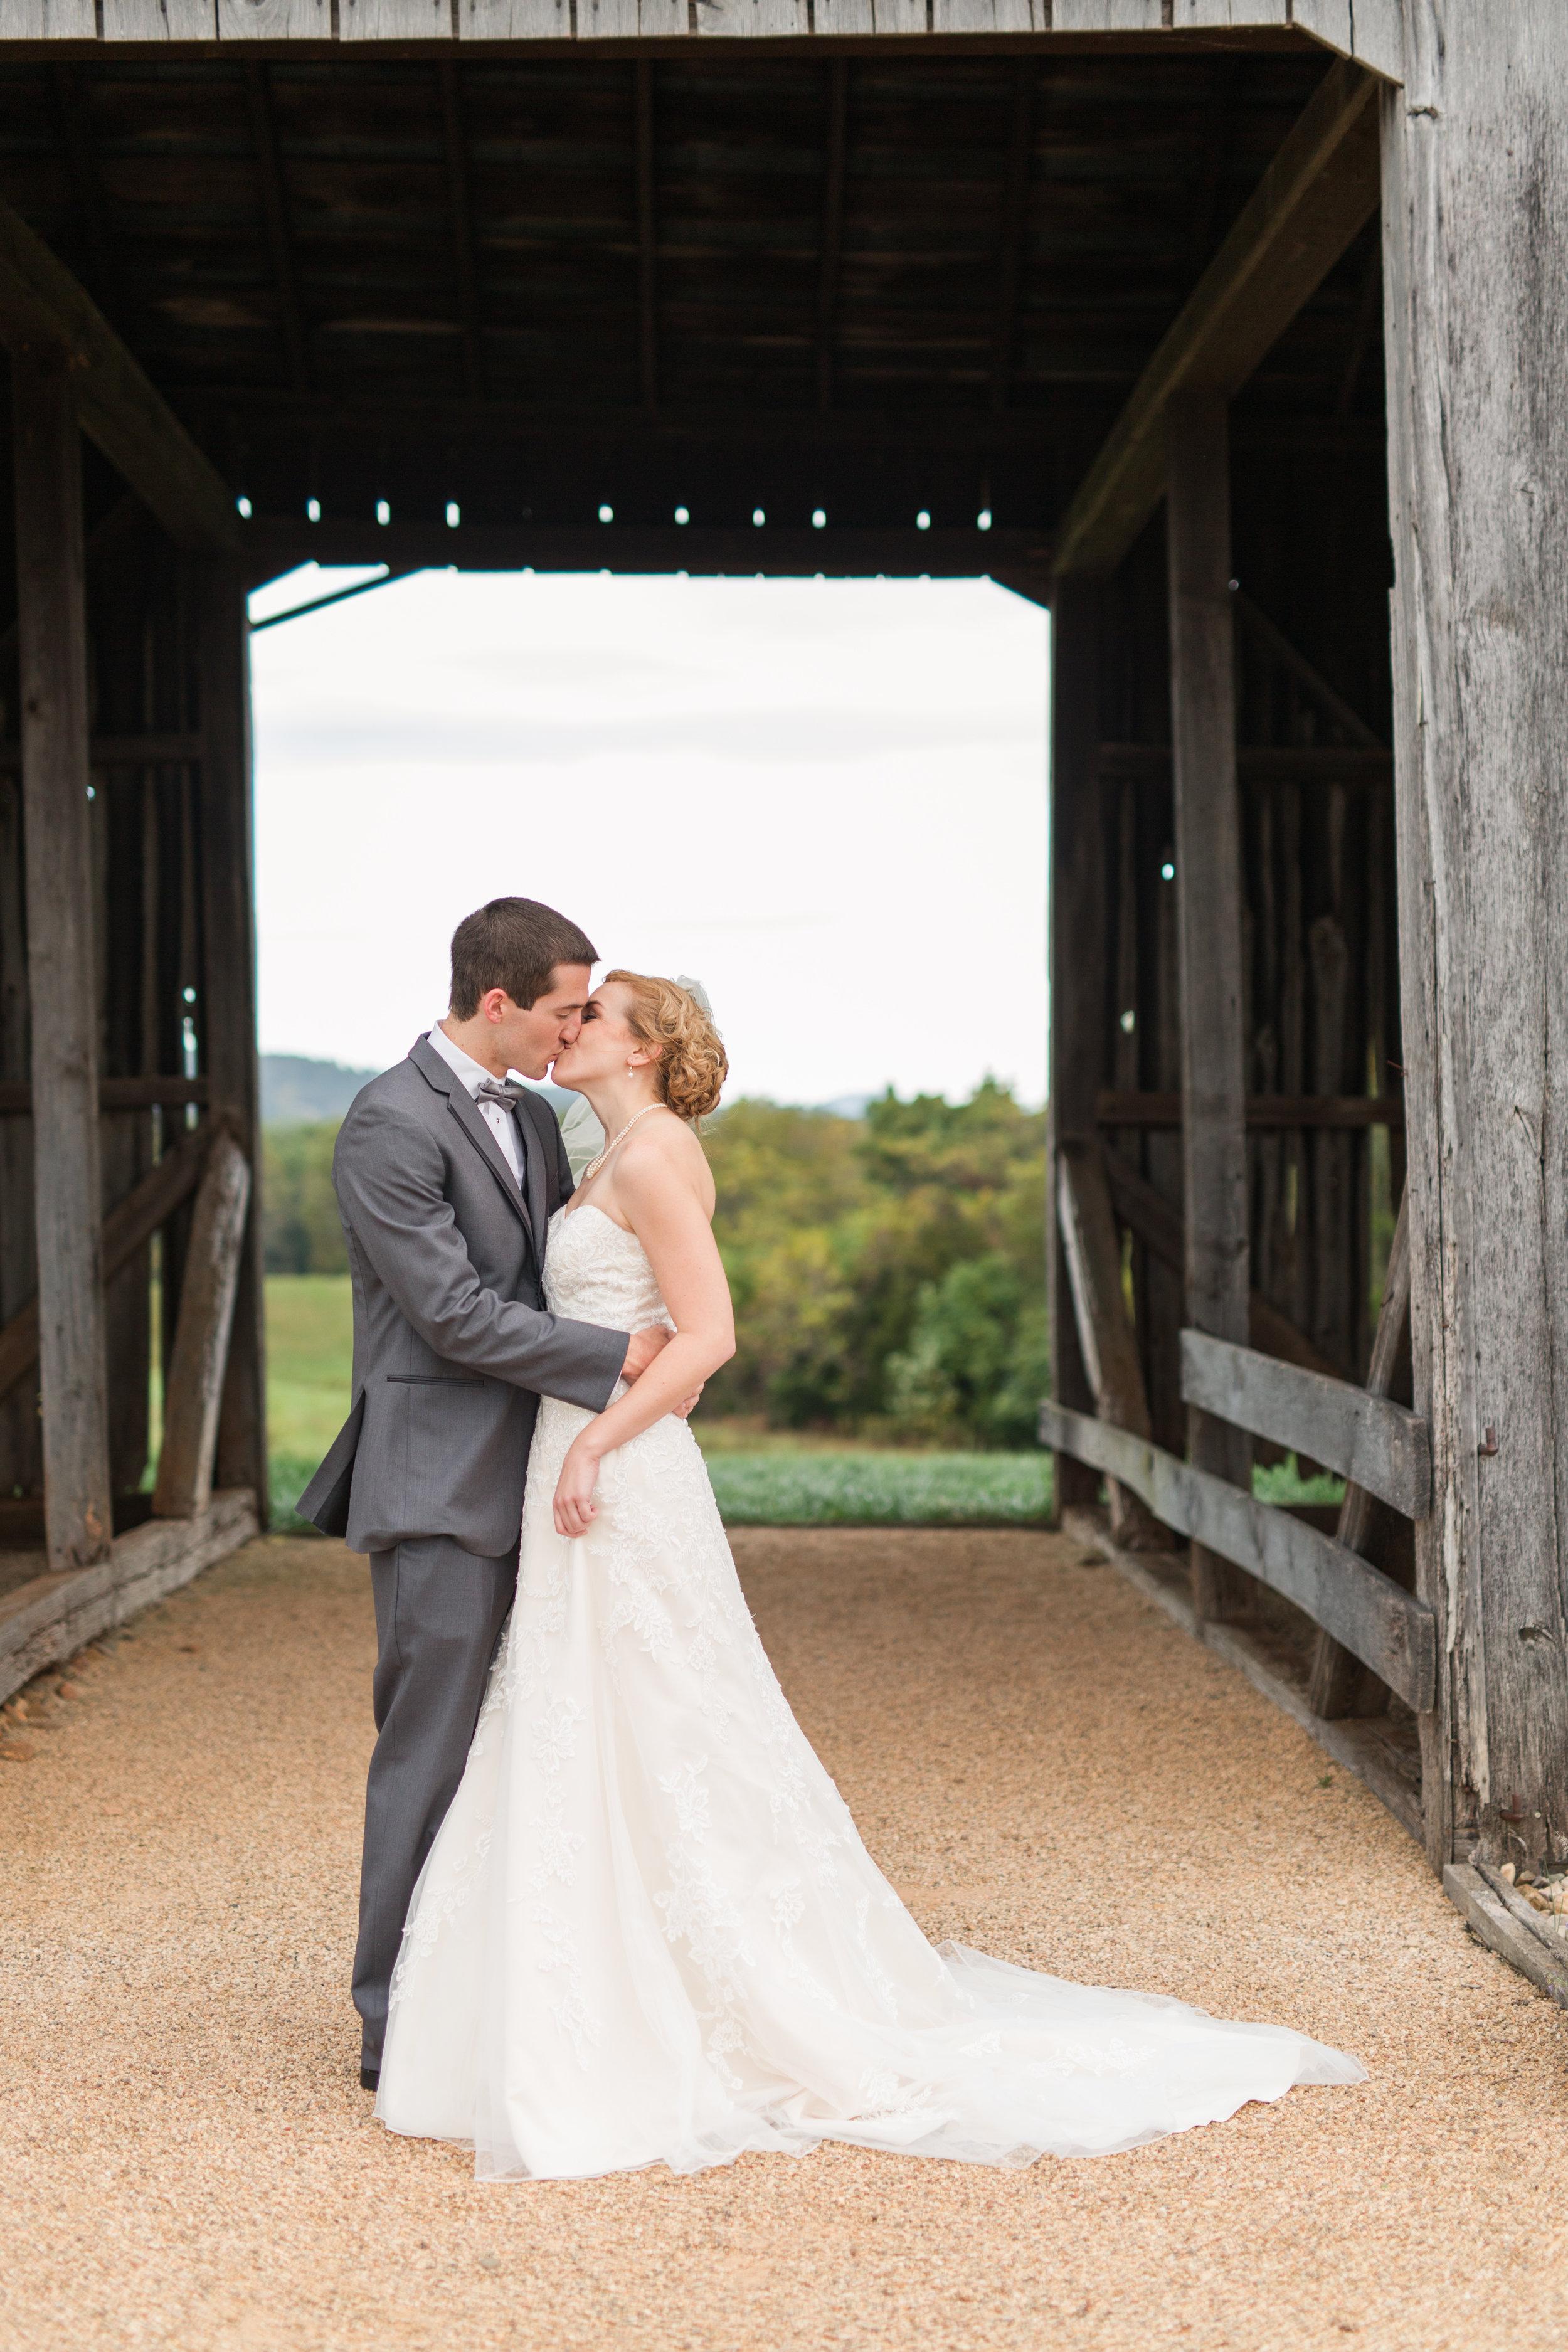 Lynchburg Virginia Wedding Photographer || Central Virginia Wedding Photos || Ashley Eiban Photography || www.ashleyeiban.com || Early Mountain Vineyard Wedding